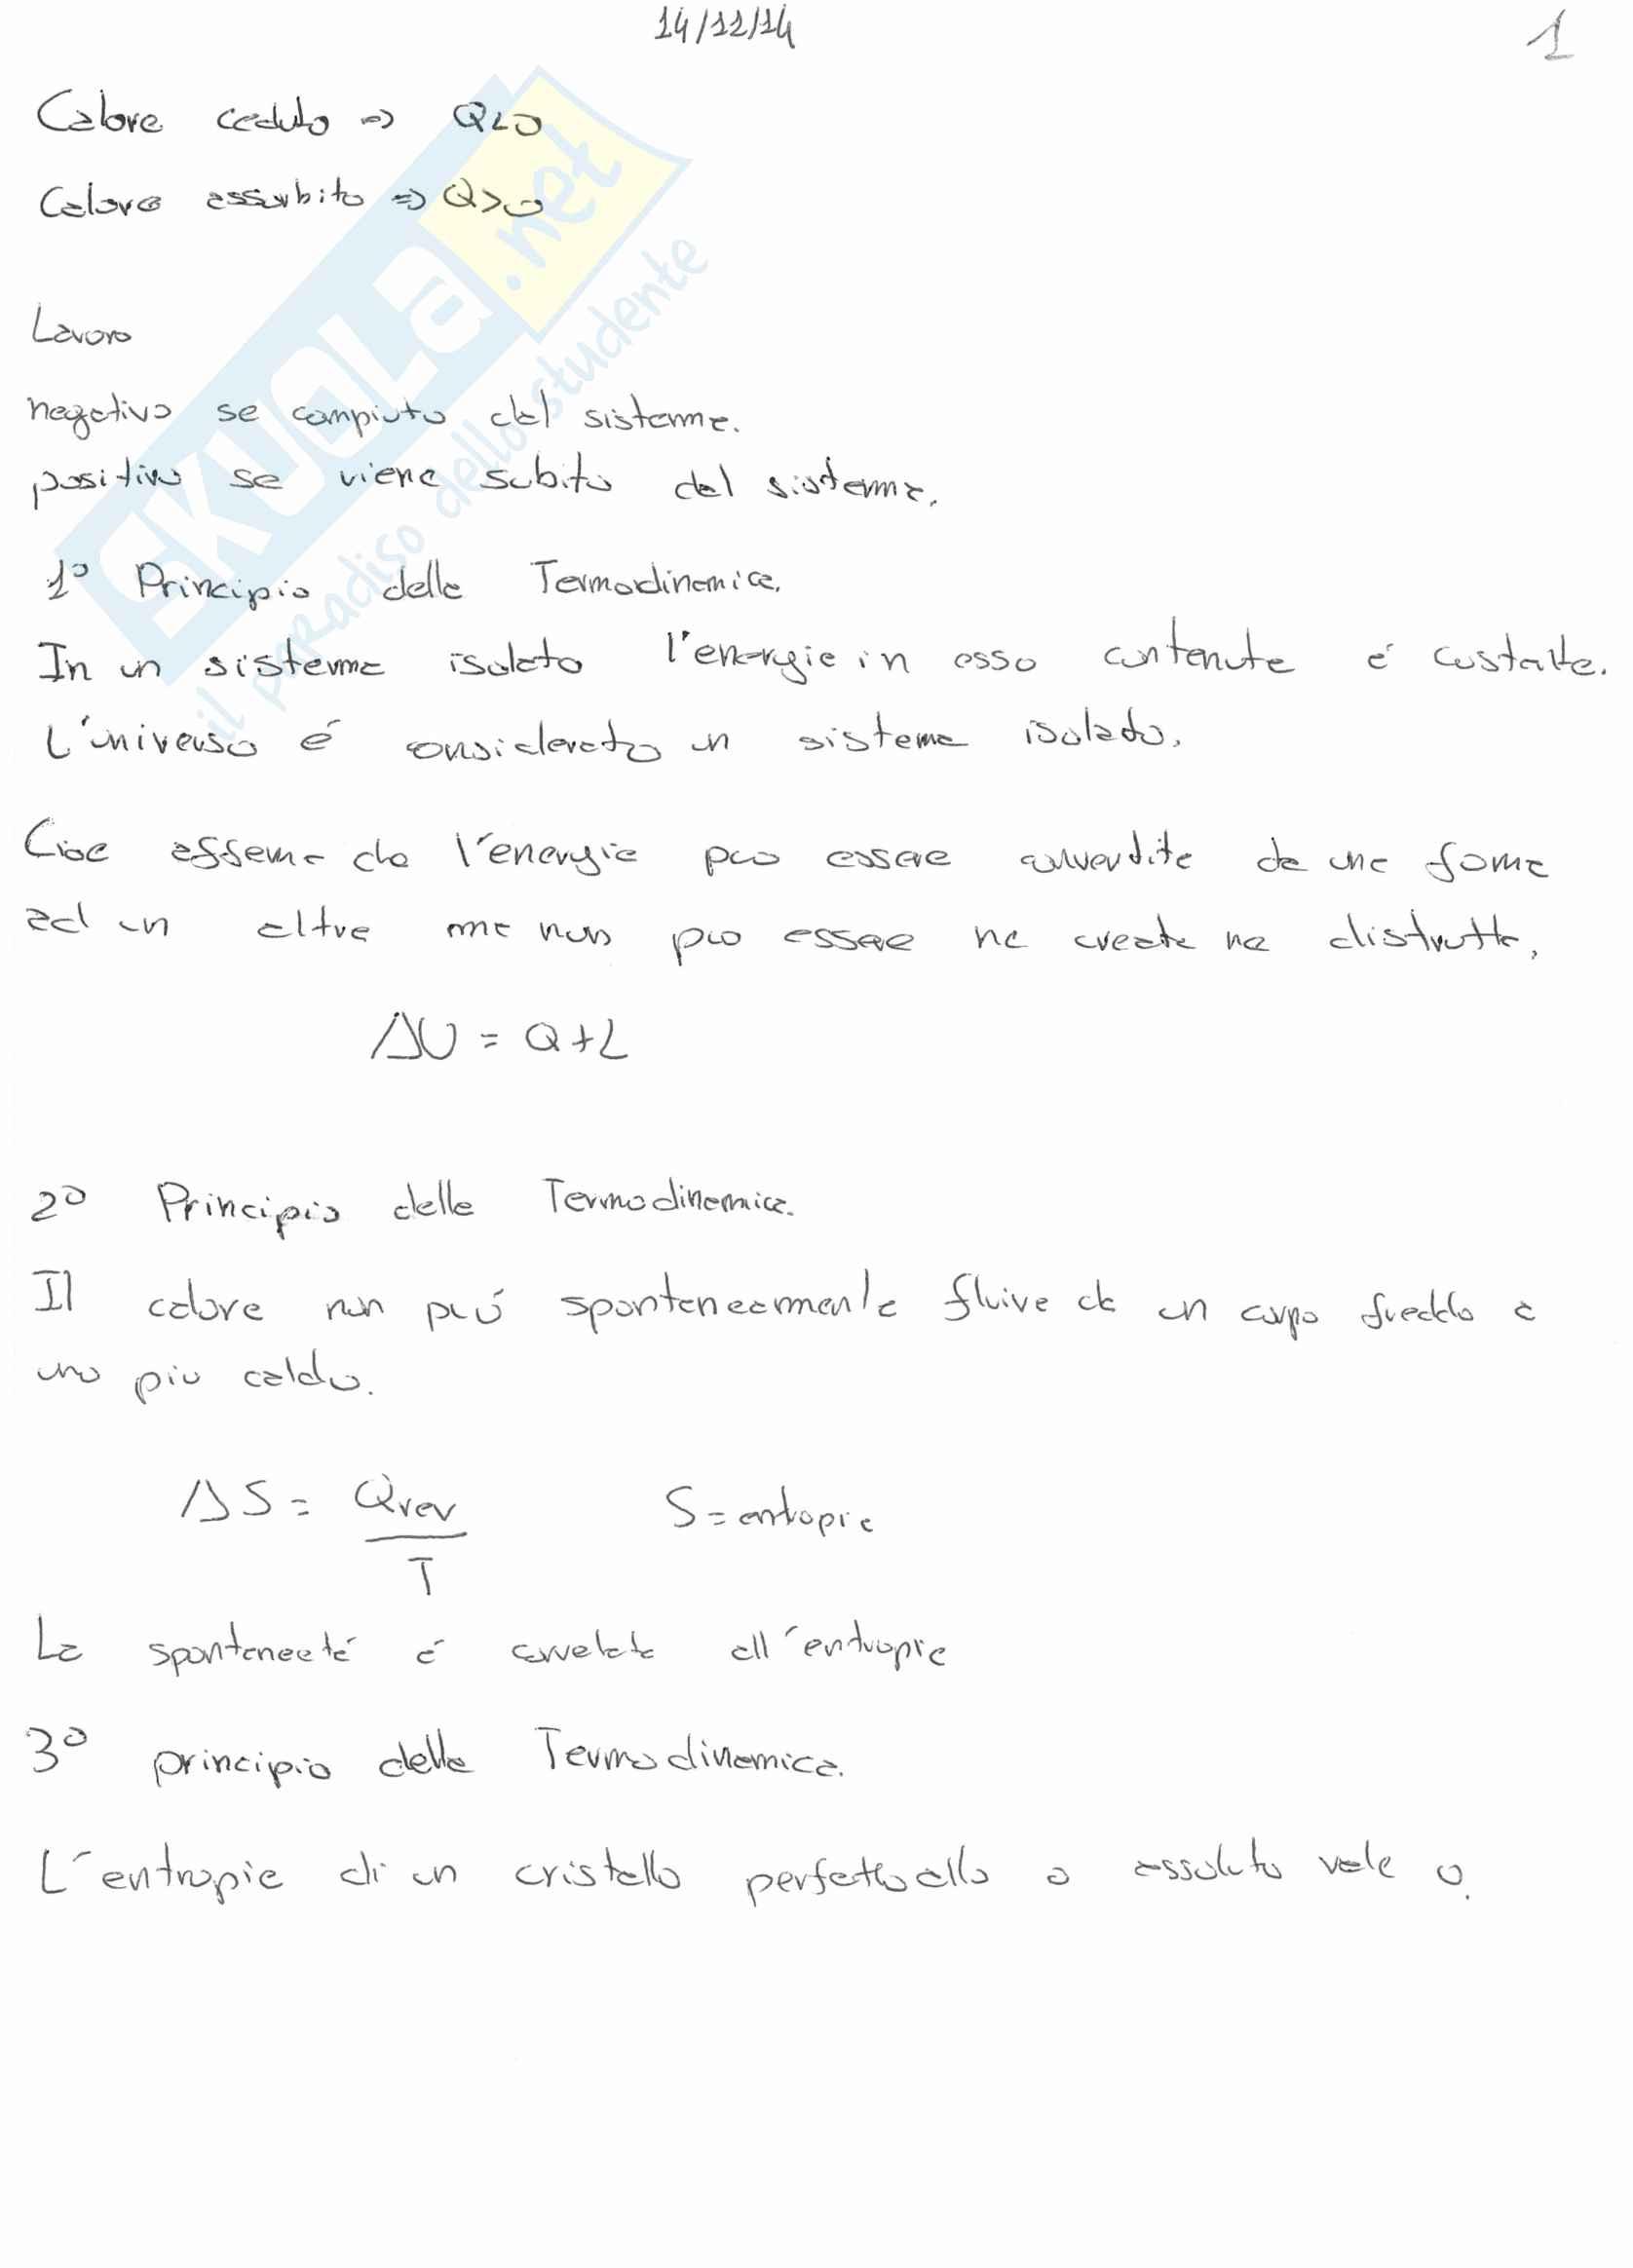 Appunti chimica-prof. Feroci